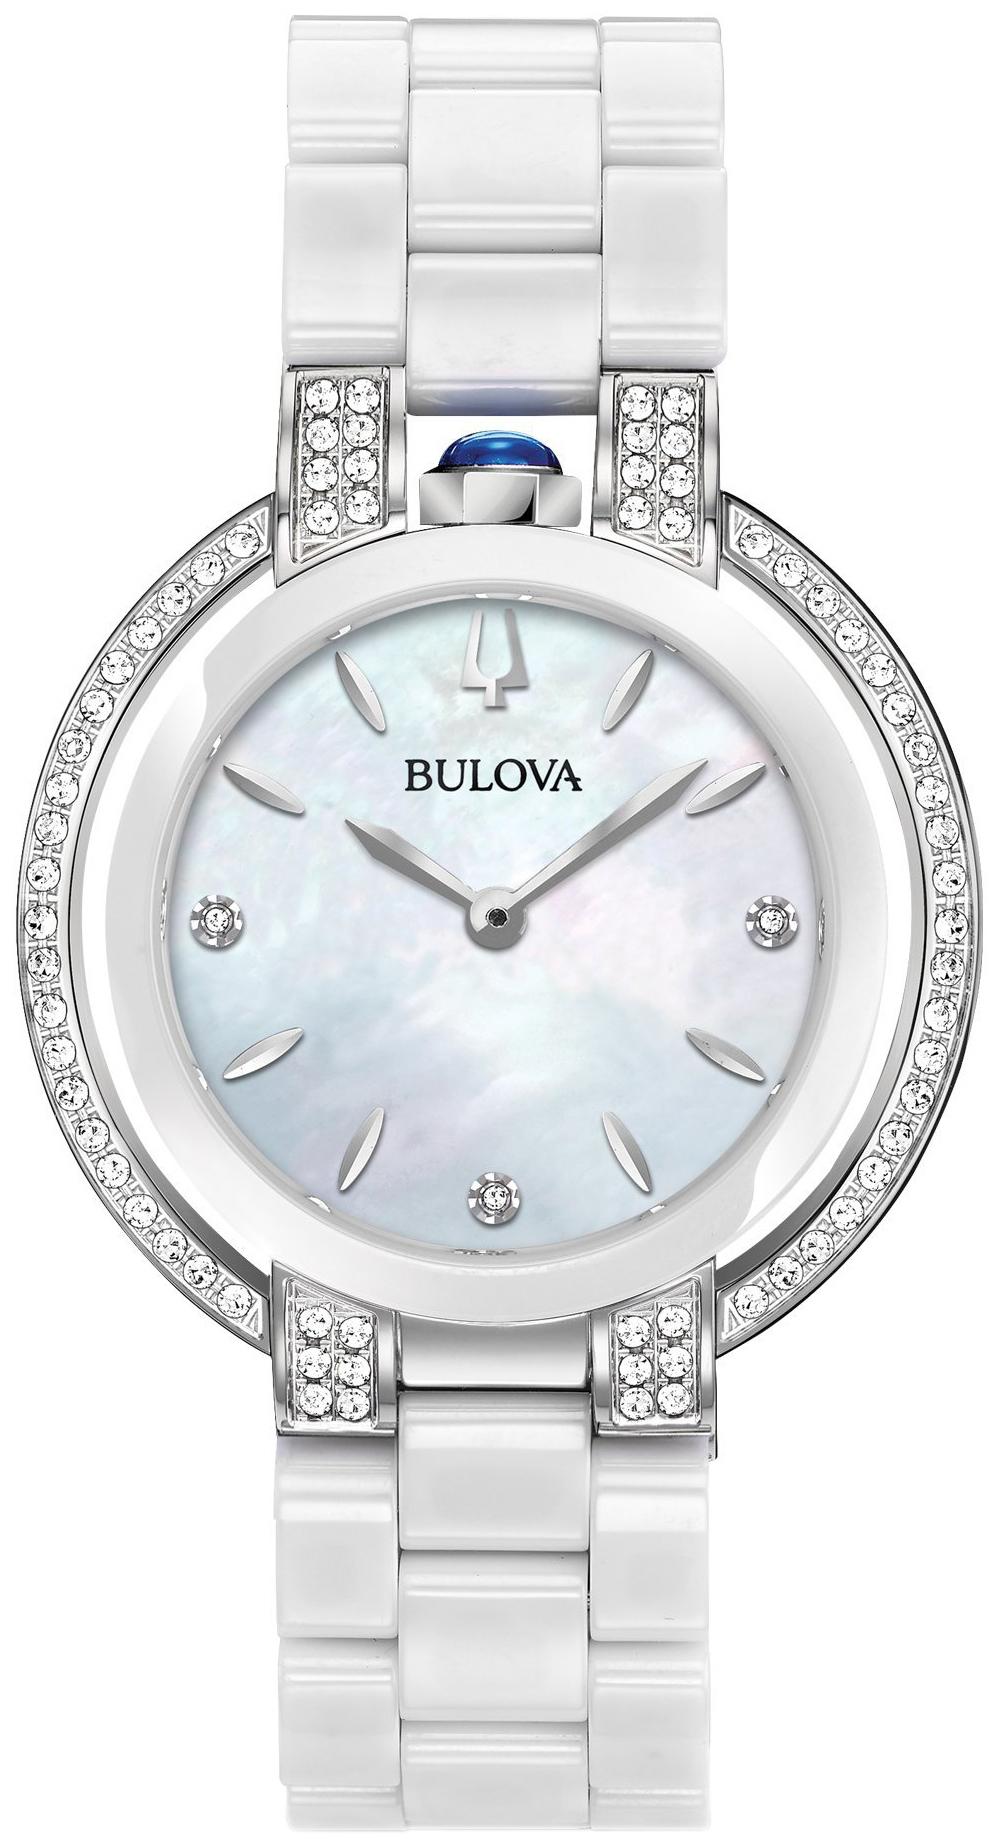 Bulova Diamond Dameklokke 98R265 Hvit/Keramik Ø35 mm - Bulova